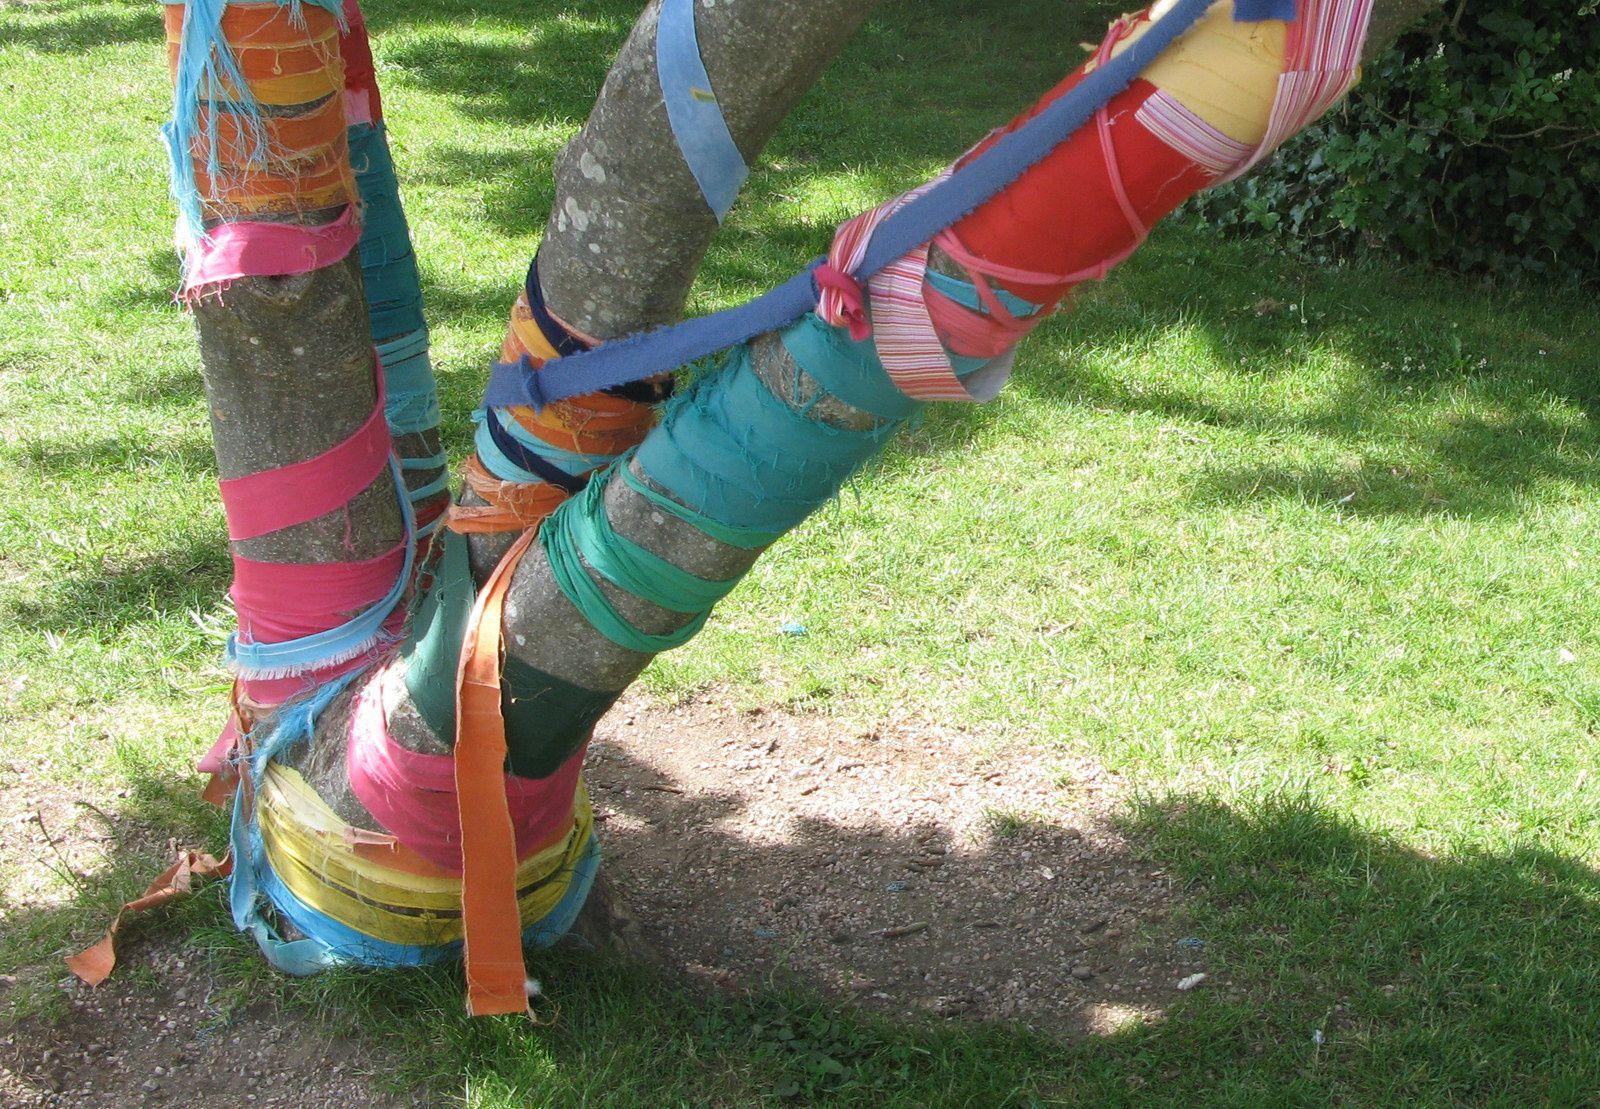 arbre ruban- aurillac- charlotteblabla blog